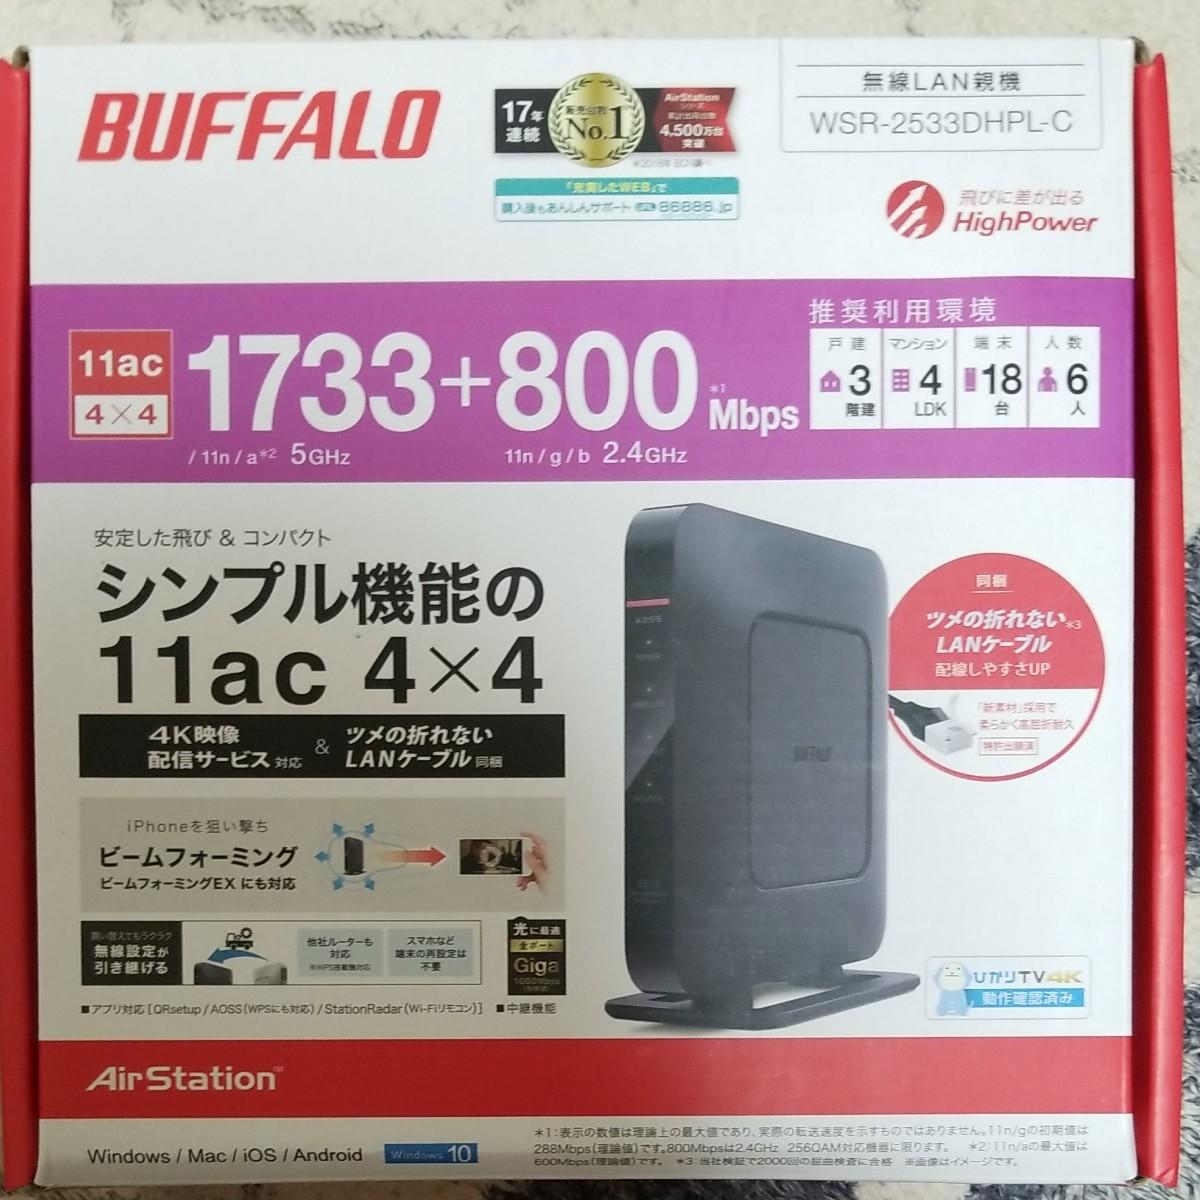 BUFFALO 無線LANルーター WSR-2533DHPL バッファロー 4LDK WiFi